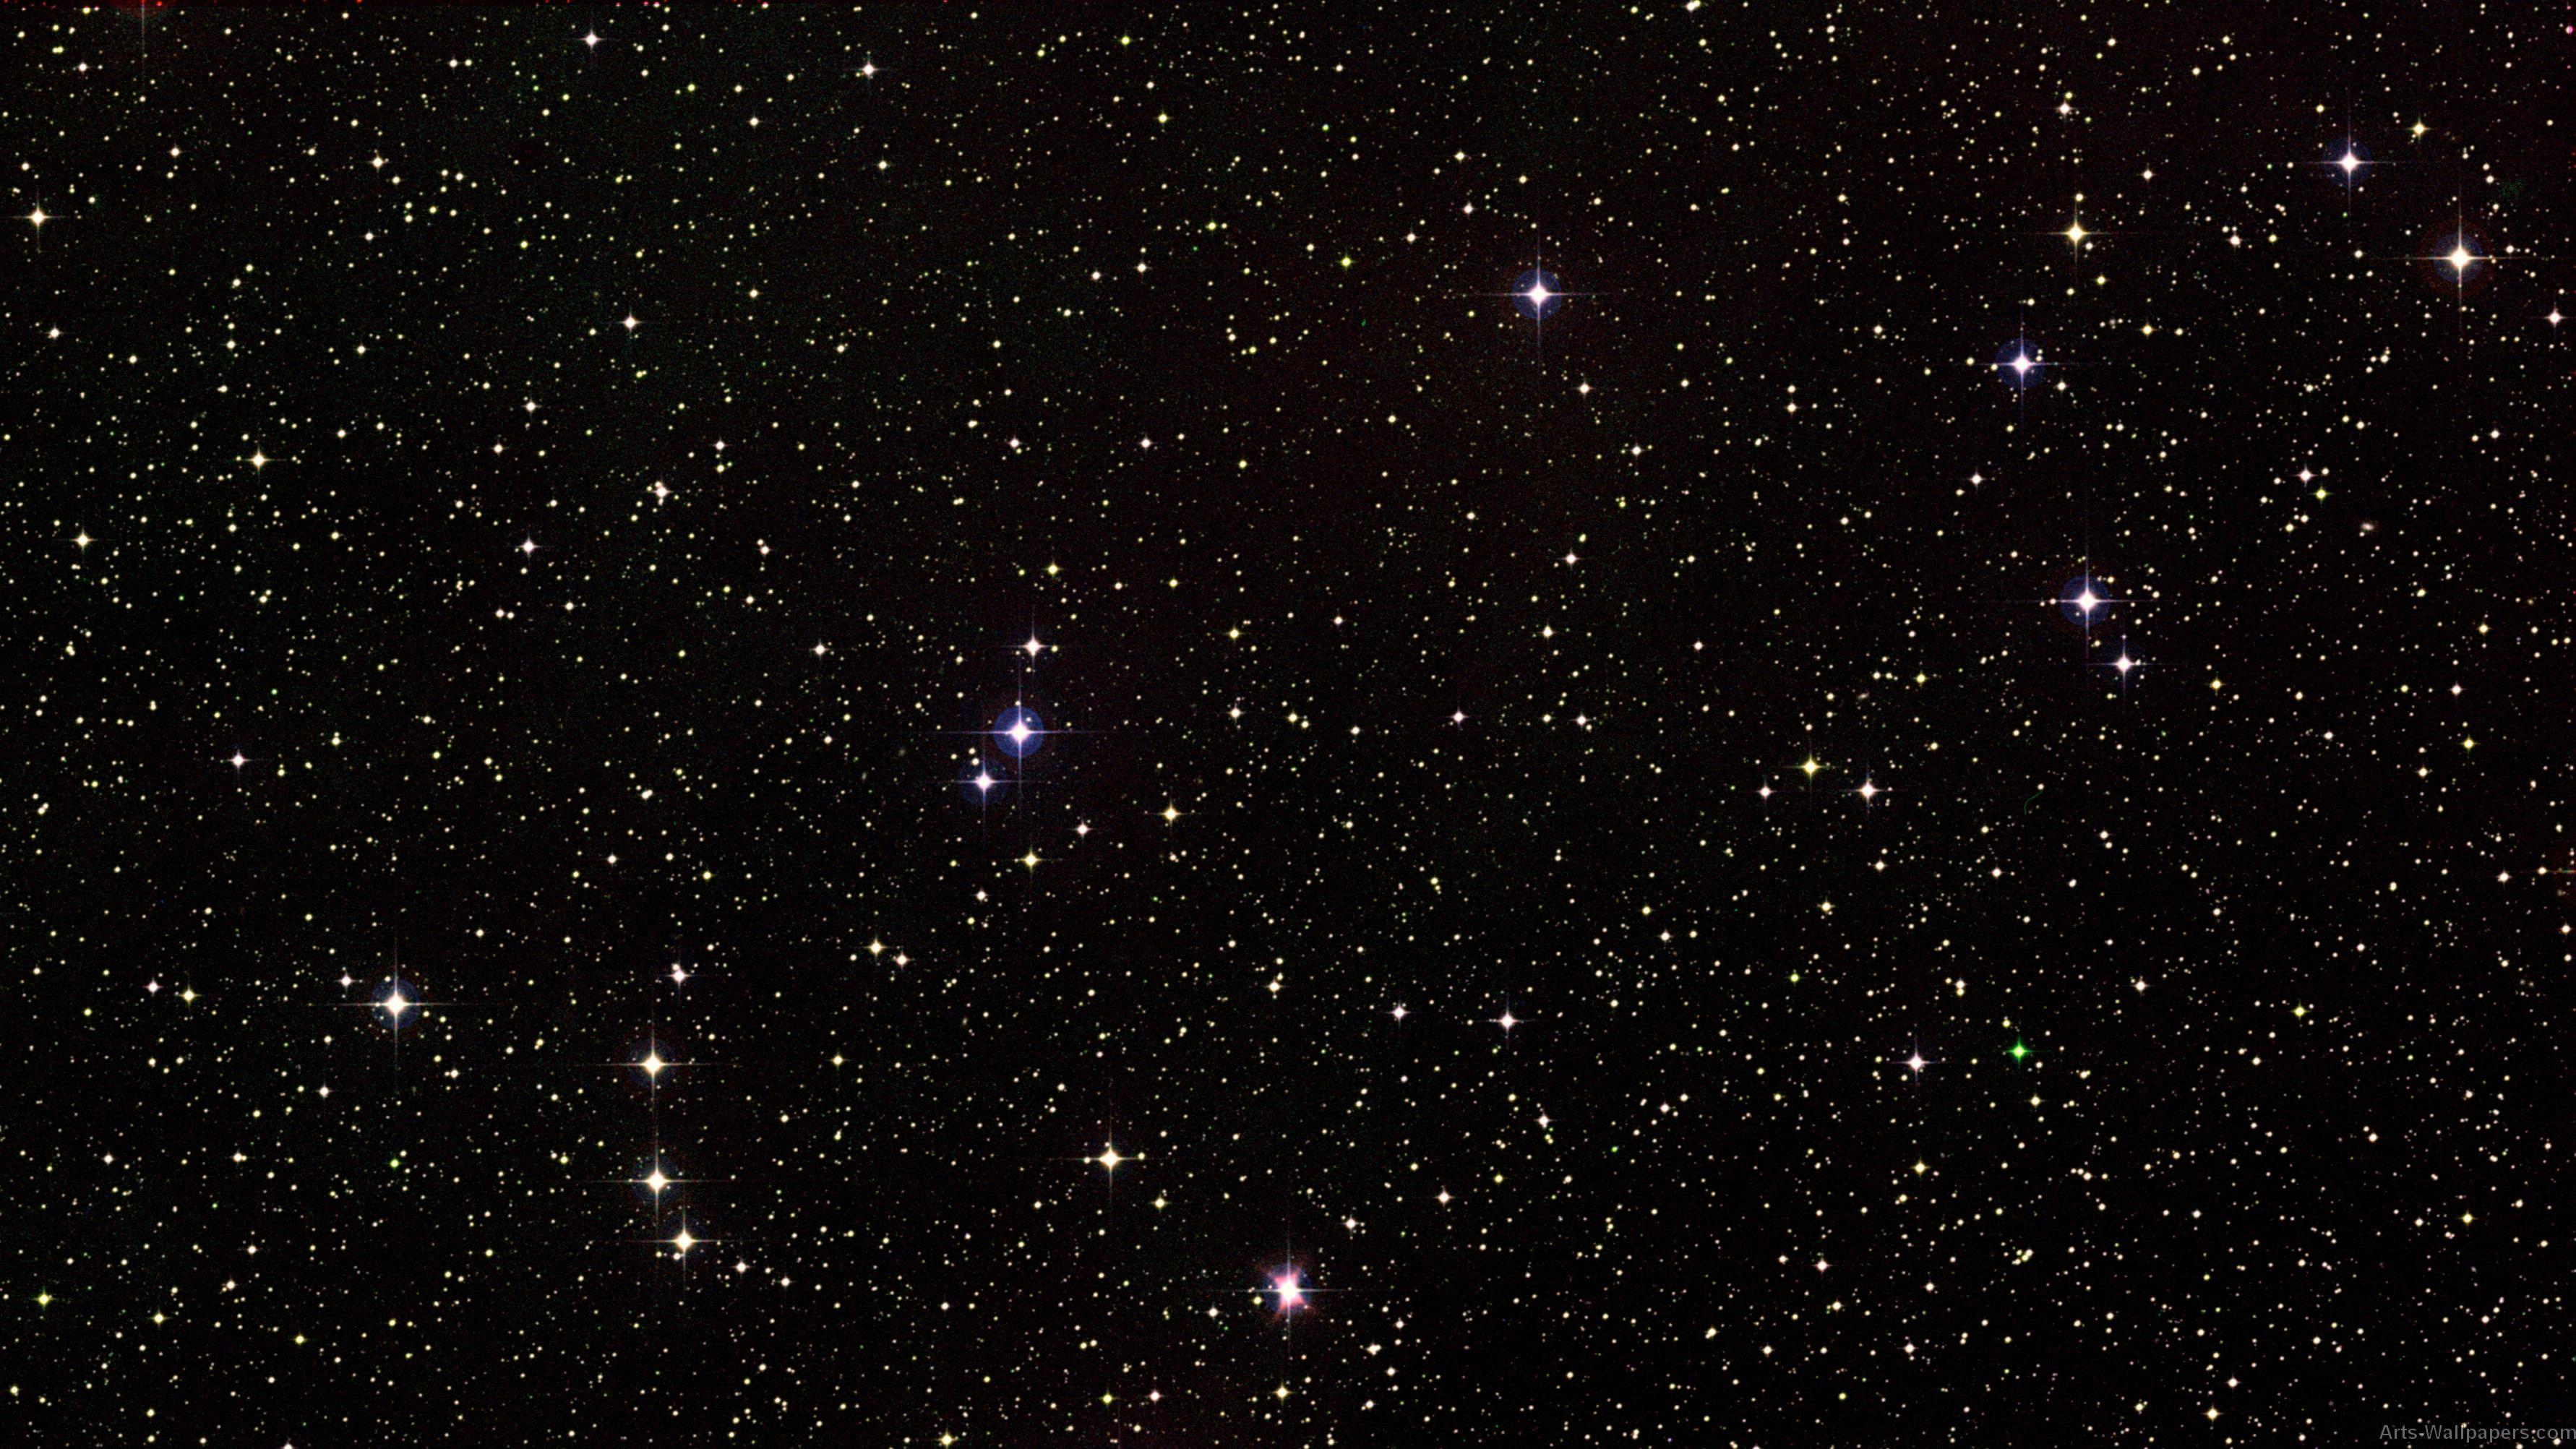 Space Stars Wallpaper 3564x2005